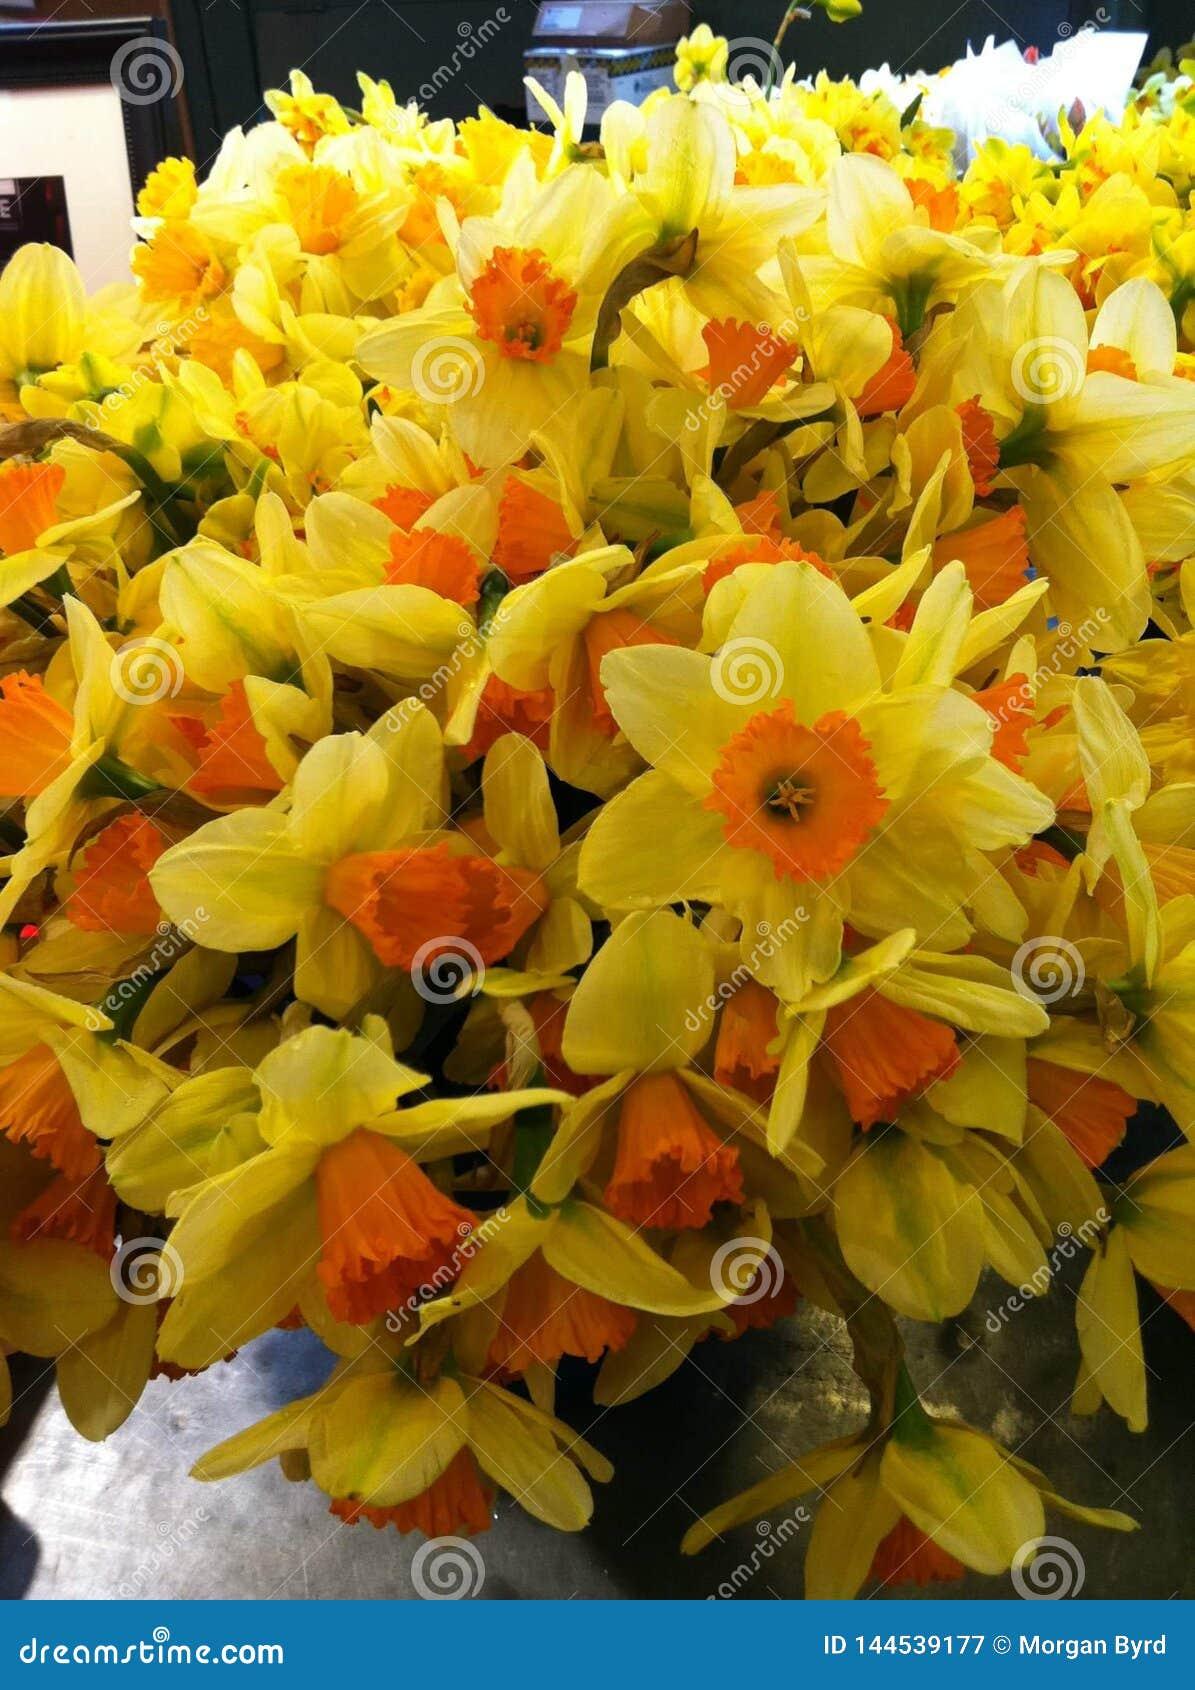 Сад бриллиантово-желтого и оранжевых Daffodils